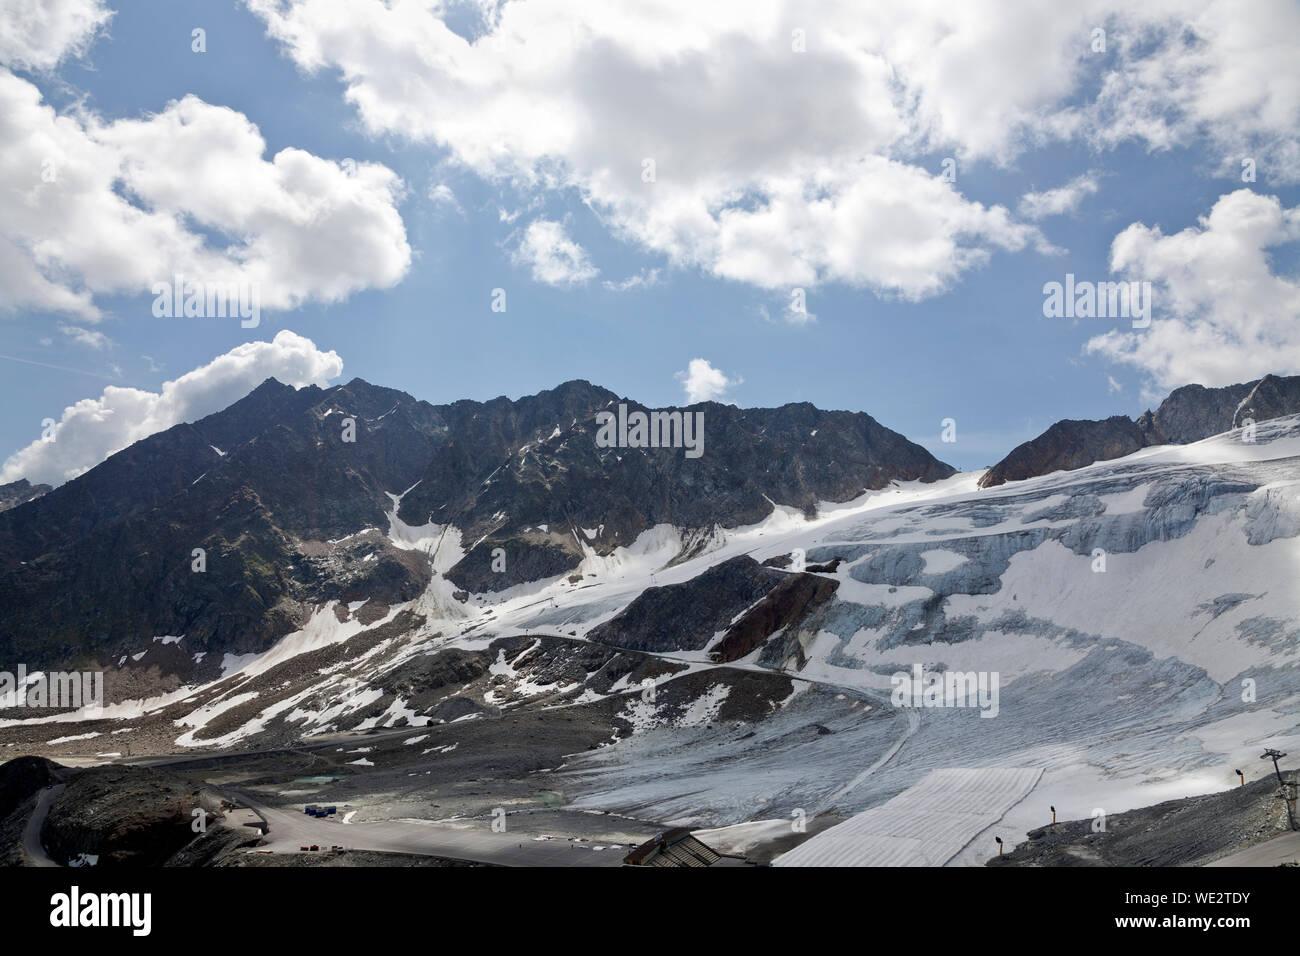 The Rettenbach glacier in Sölden, Ötztal, Tyrol, Austria in July Stock Photo